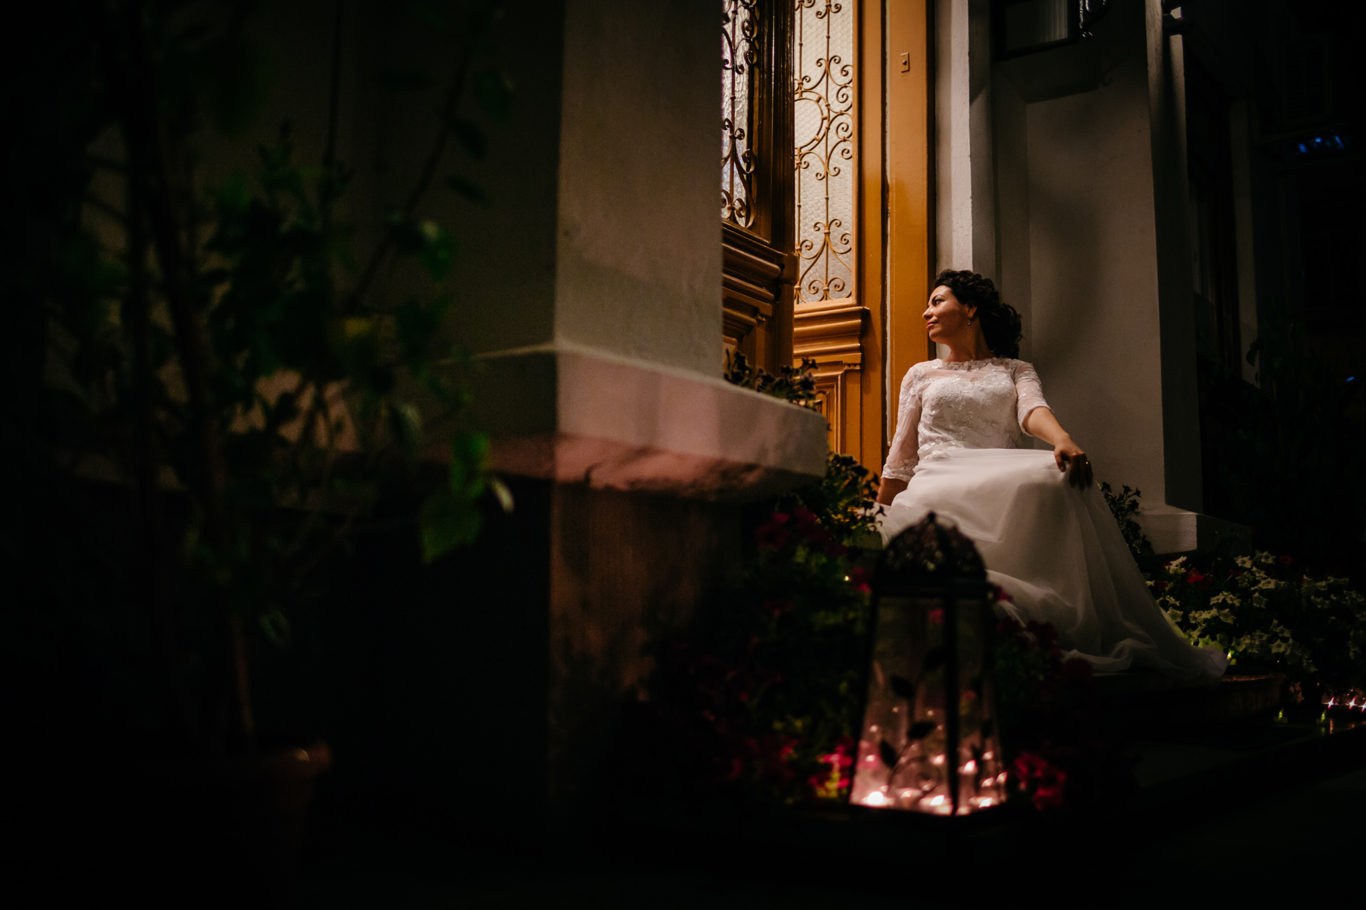 0716-fotografie-nunta-bucuresti-anca-george-fotograf-ciprian-dumitrescu-dcf_6138